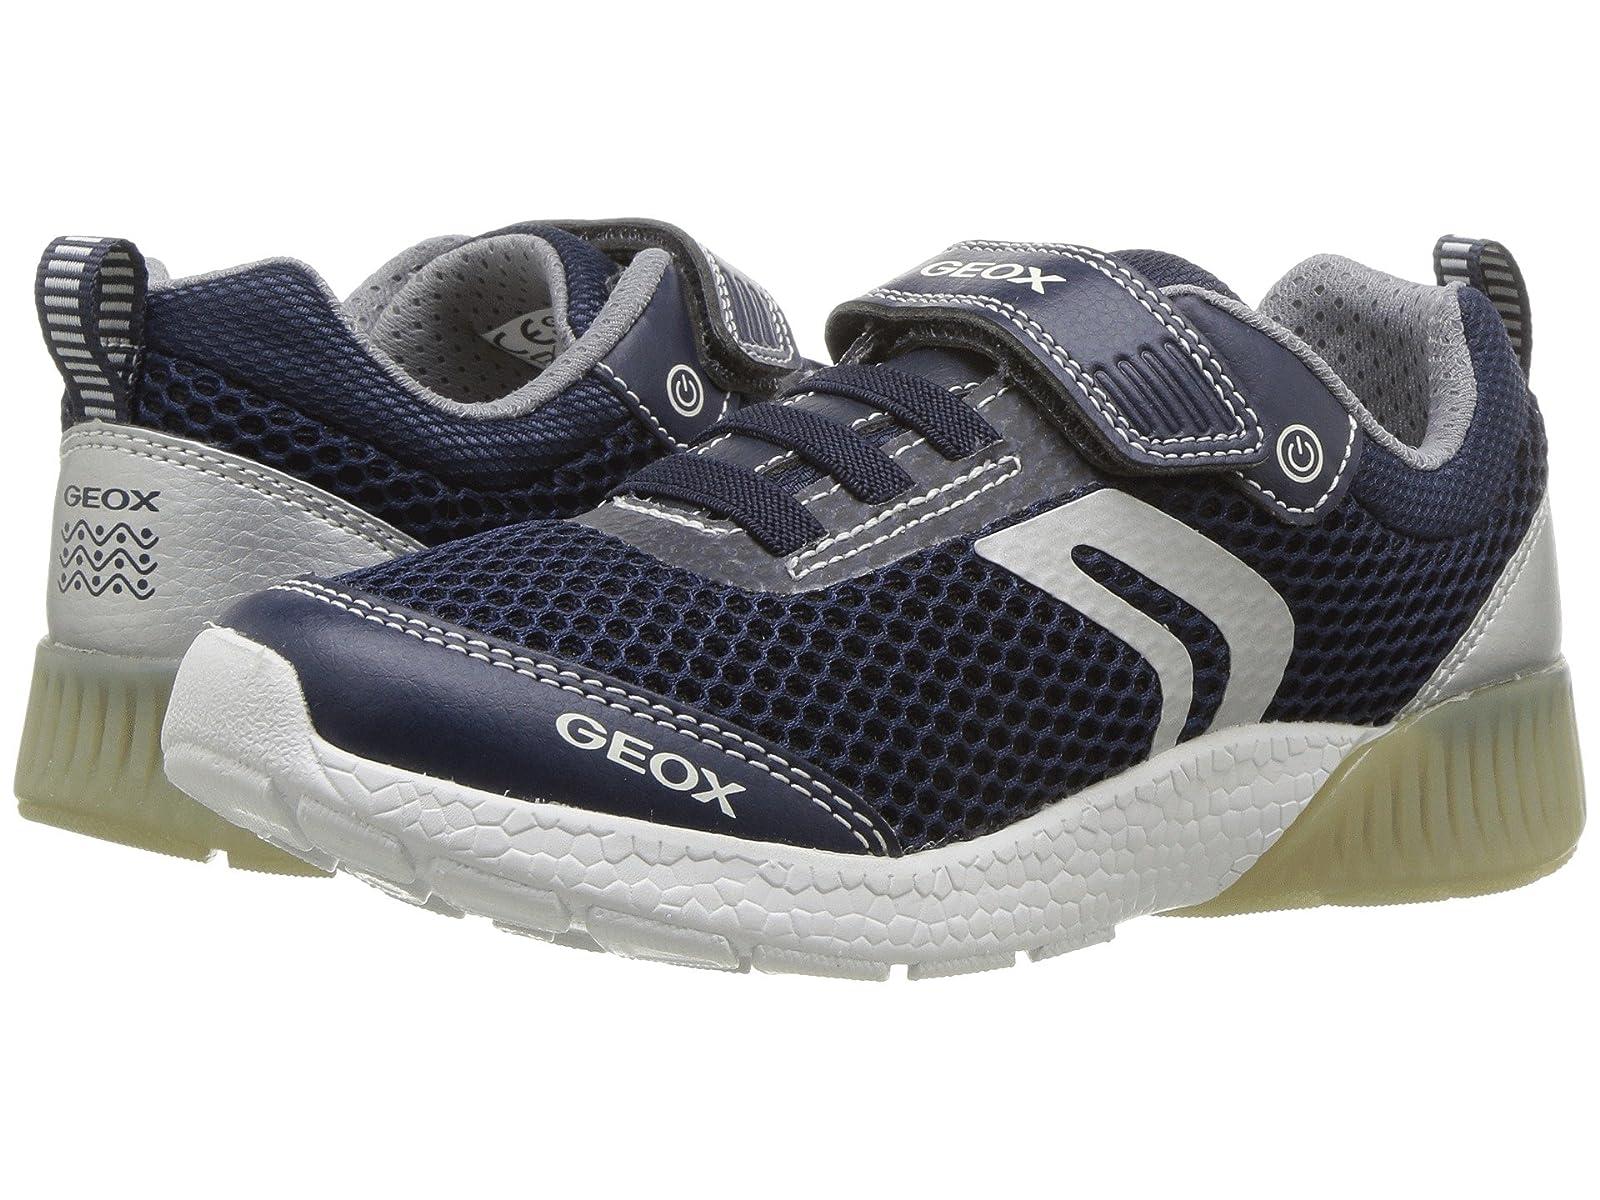 Geox Kids Sveth 2 (Little Kid/Big Kid)Atmospheric grades have affordable shoes